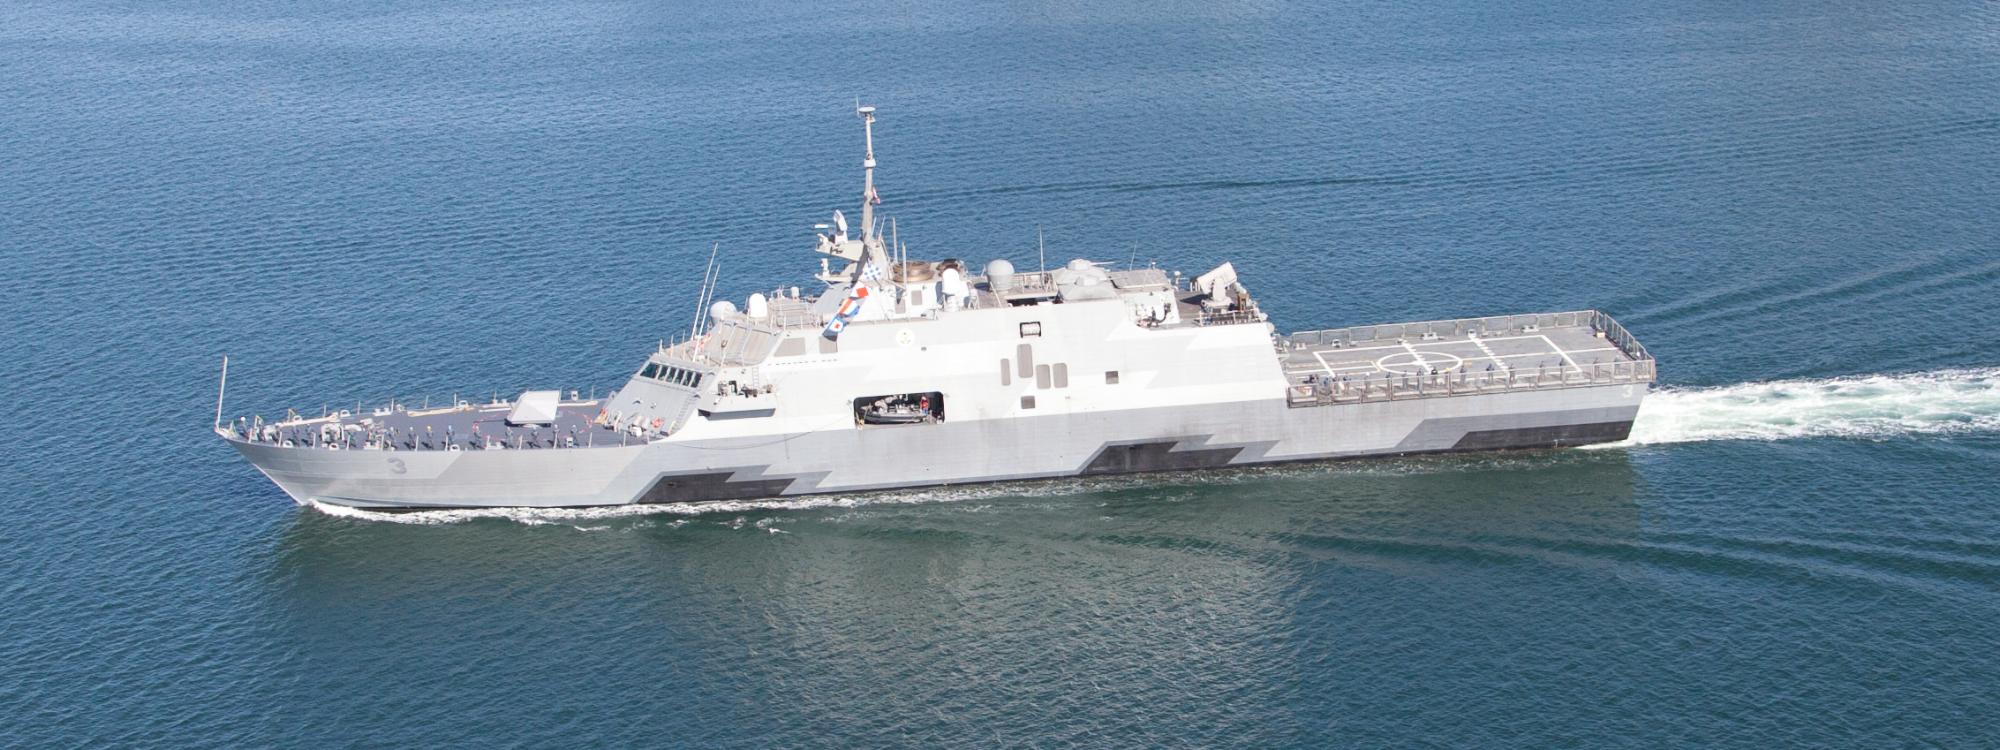 fmm-ship-2000x750